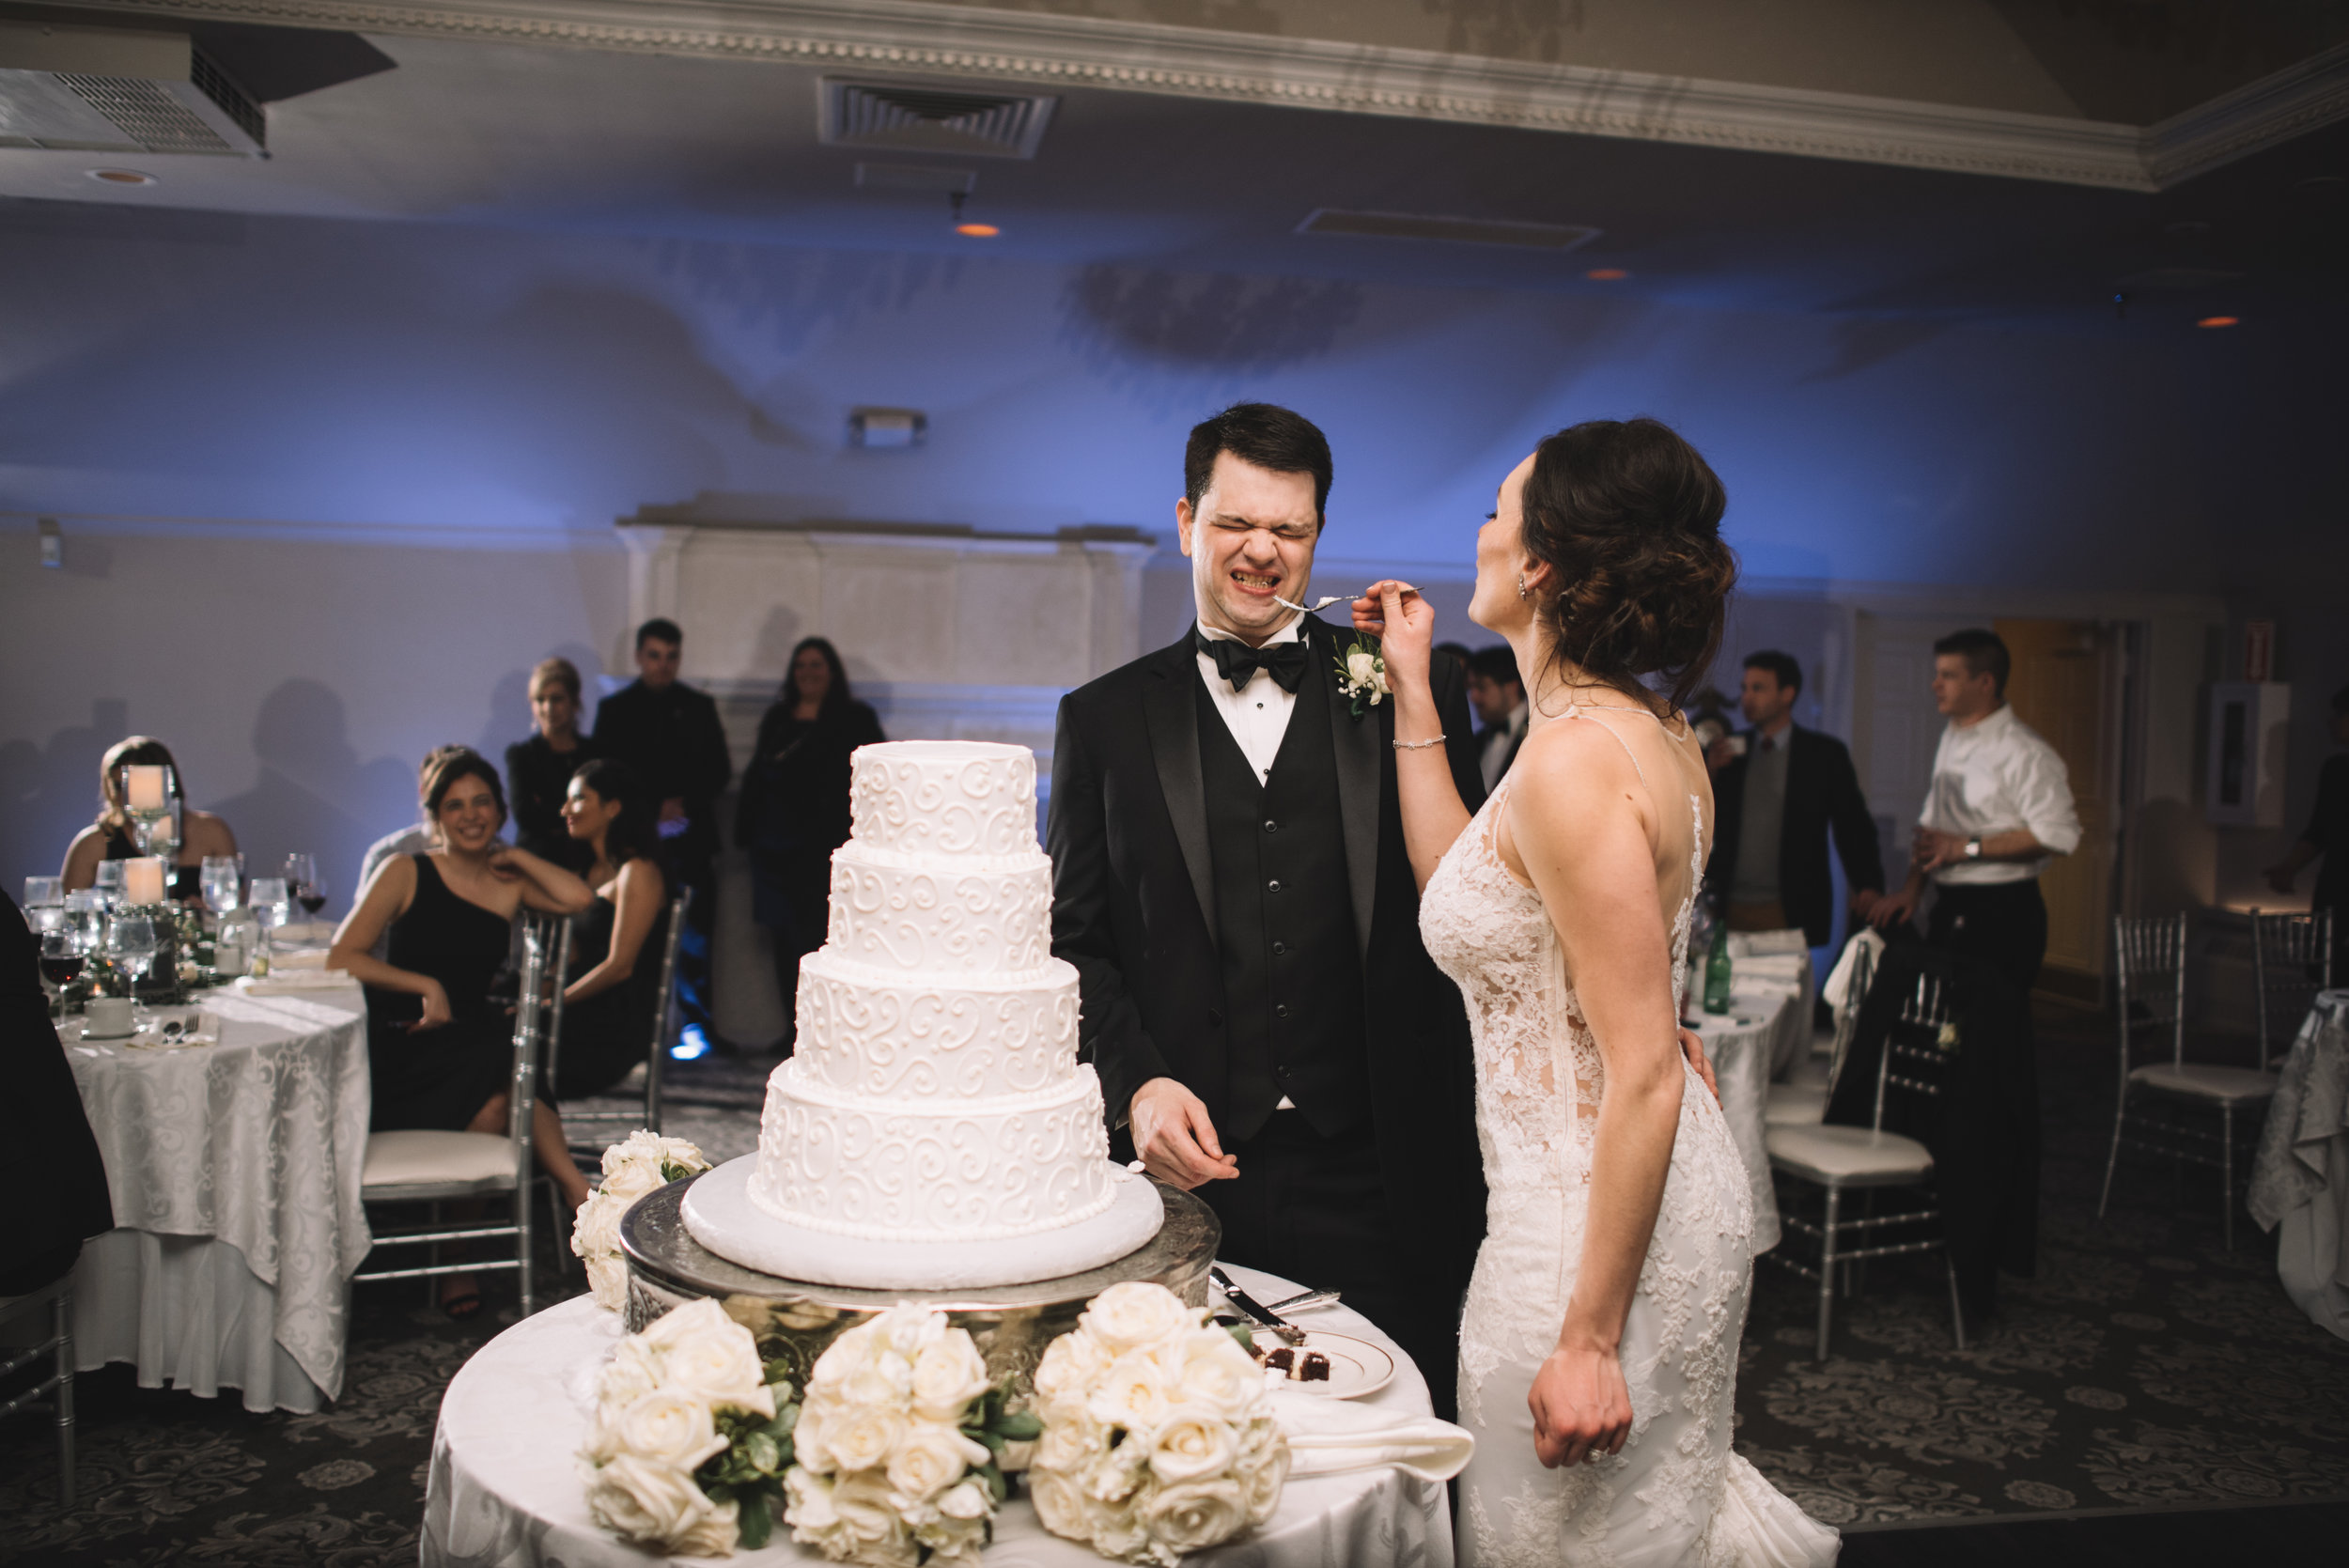 WeddingPhotos | NJPhotographer | Highlights-1-20.jpg